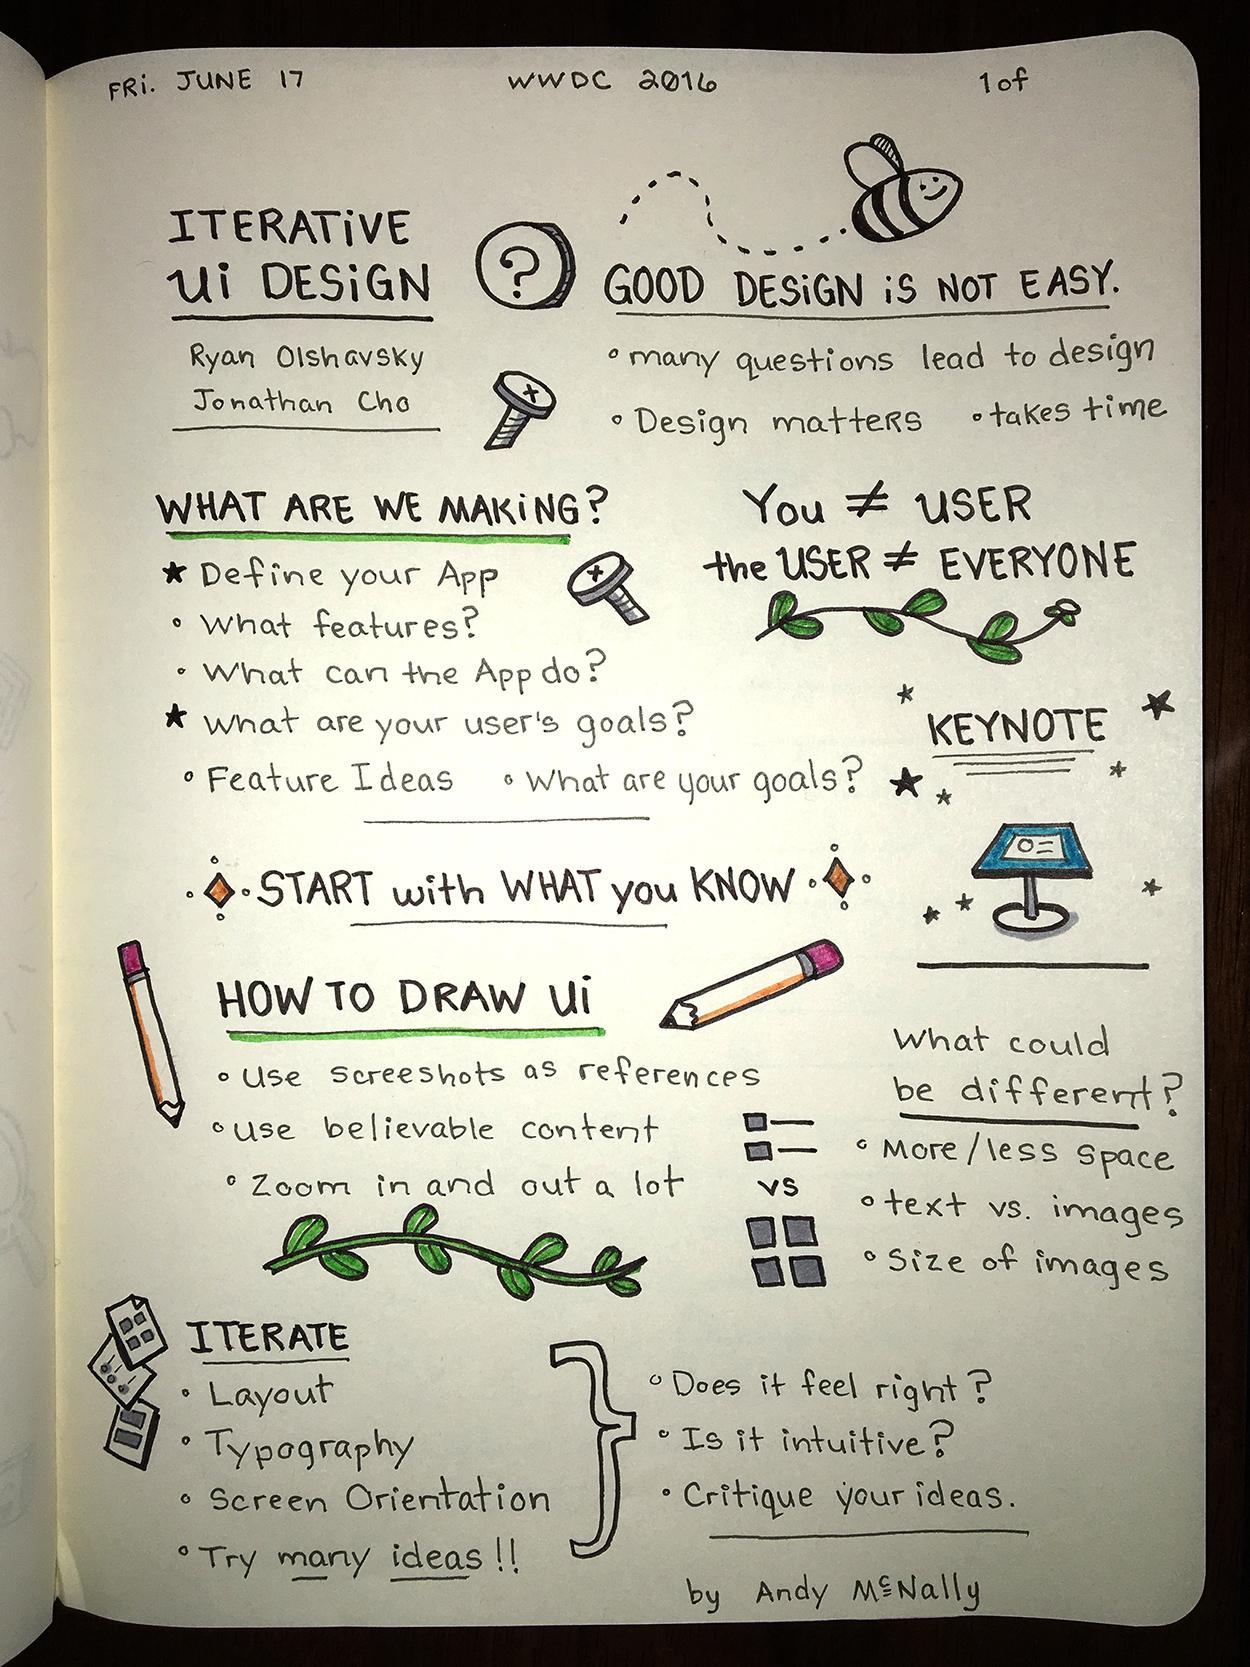 WWDC sketchnotes - Iterative UI Design